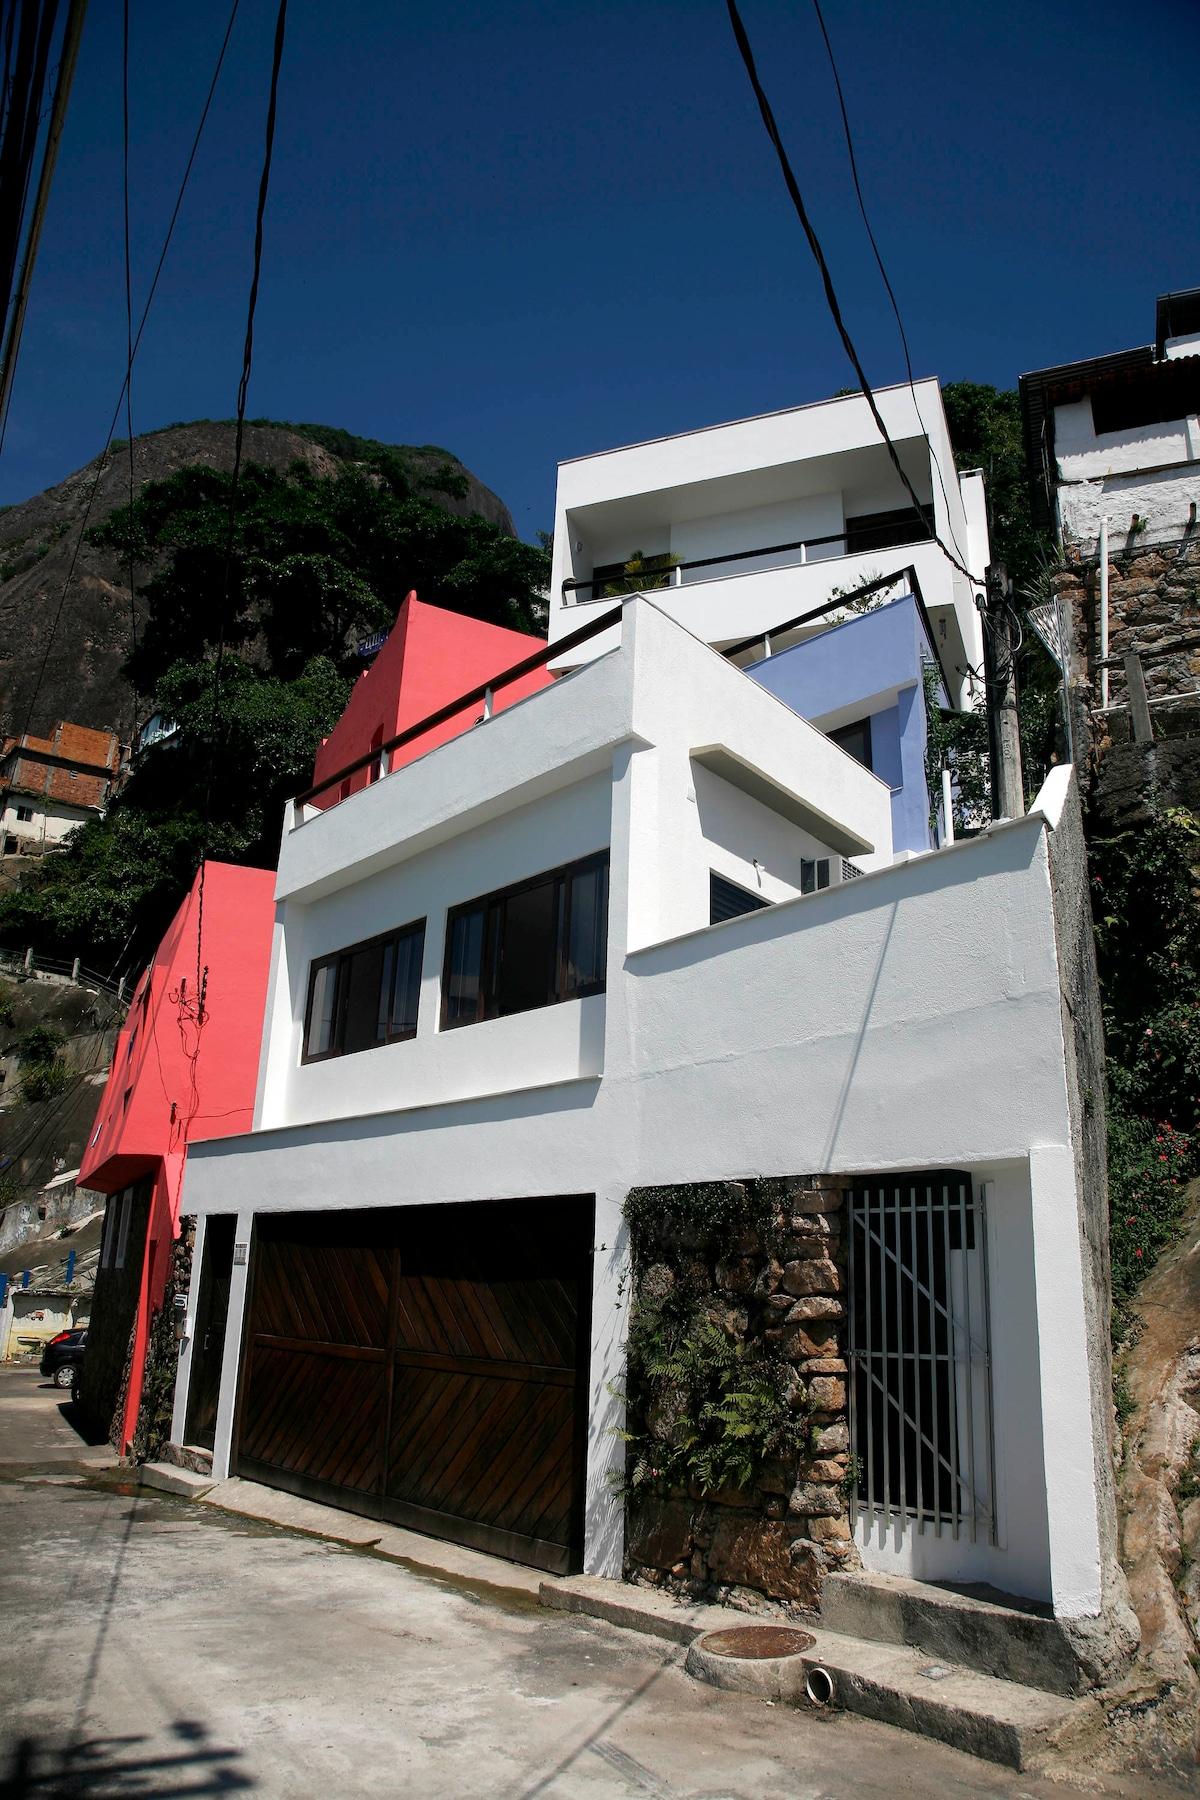 Facade of the hole house